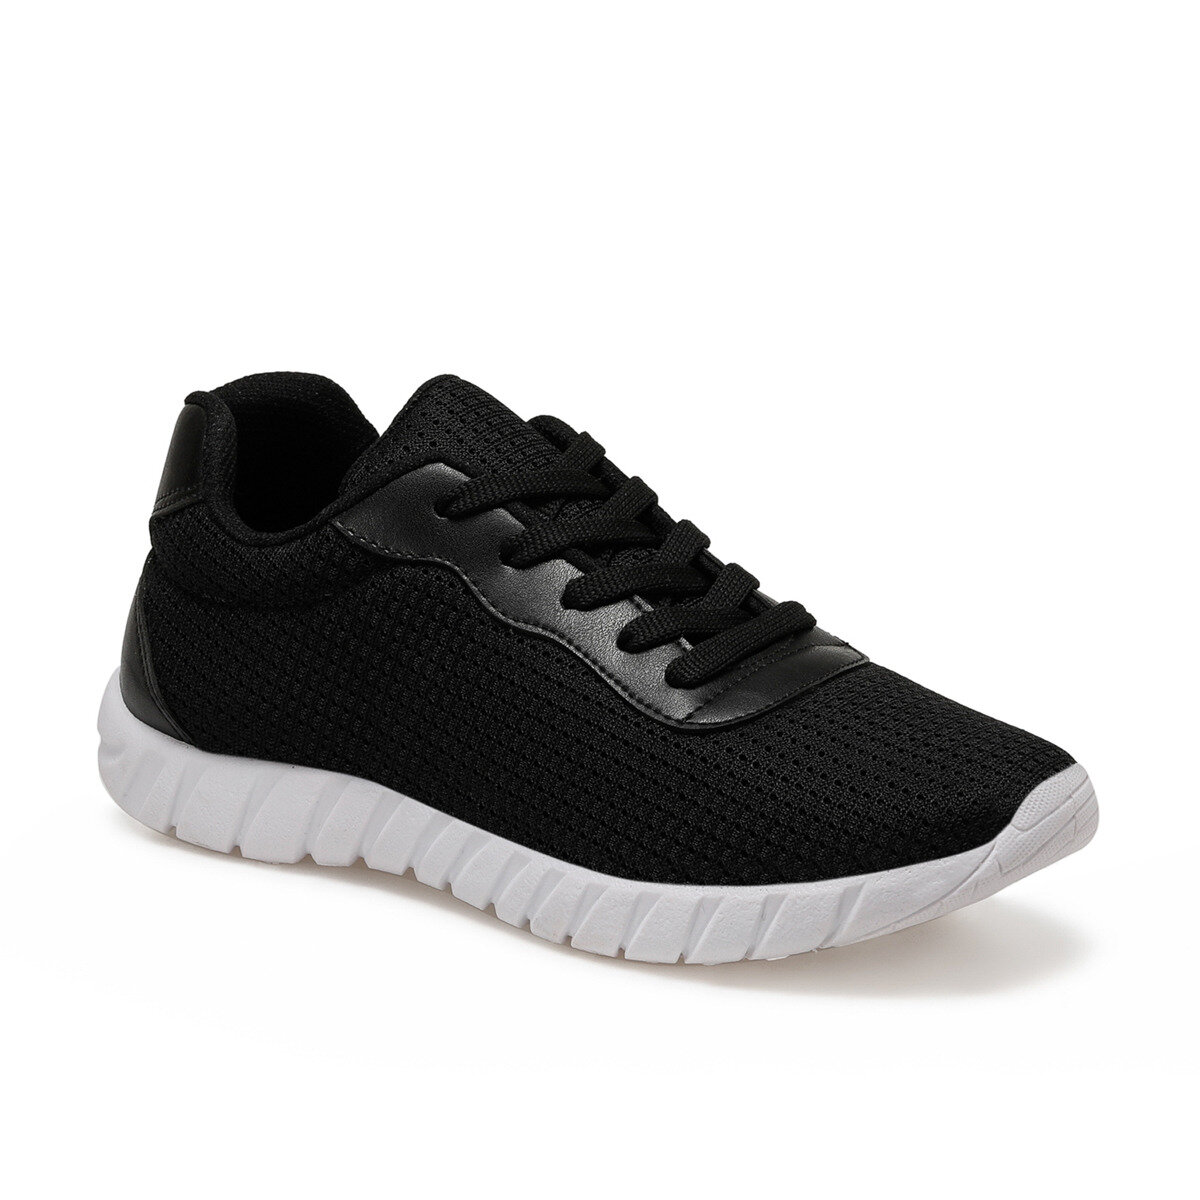 FLO CS19013 Black Women 'S Sports Shoes Art Bella